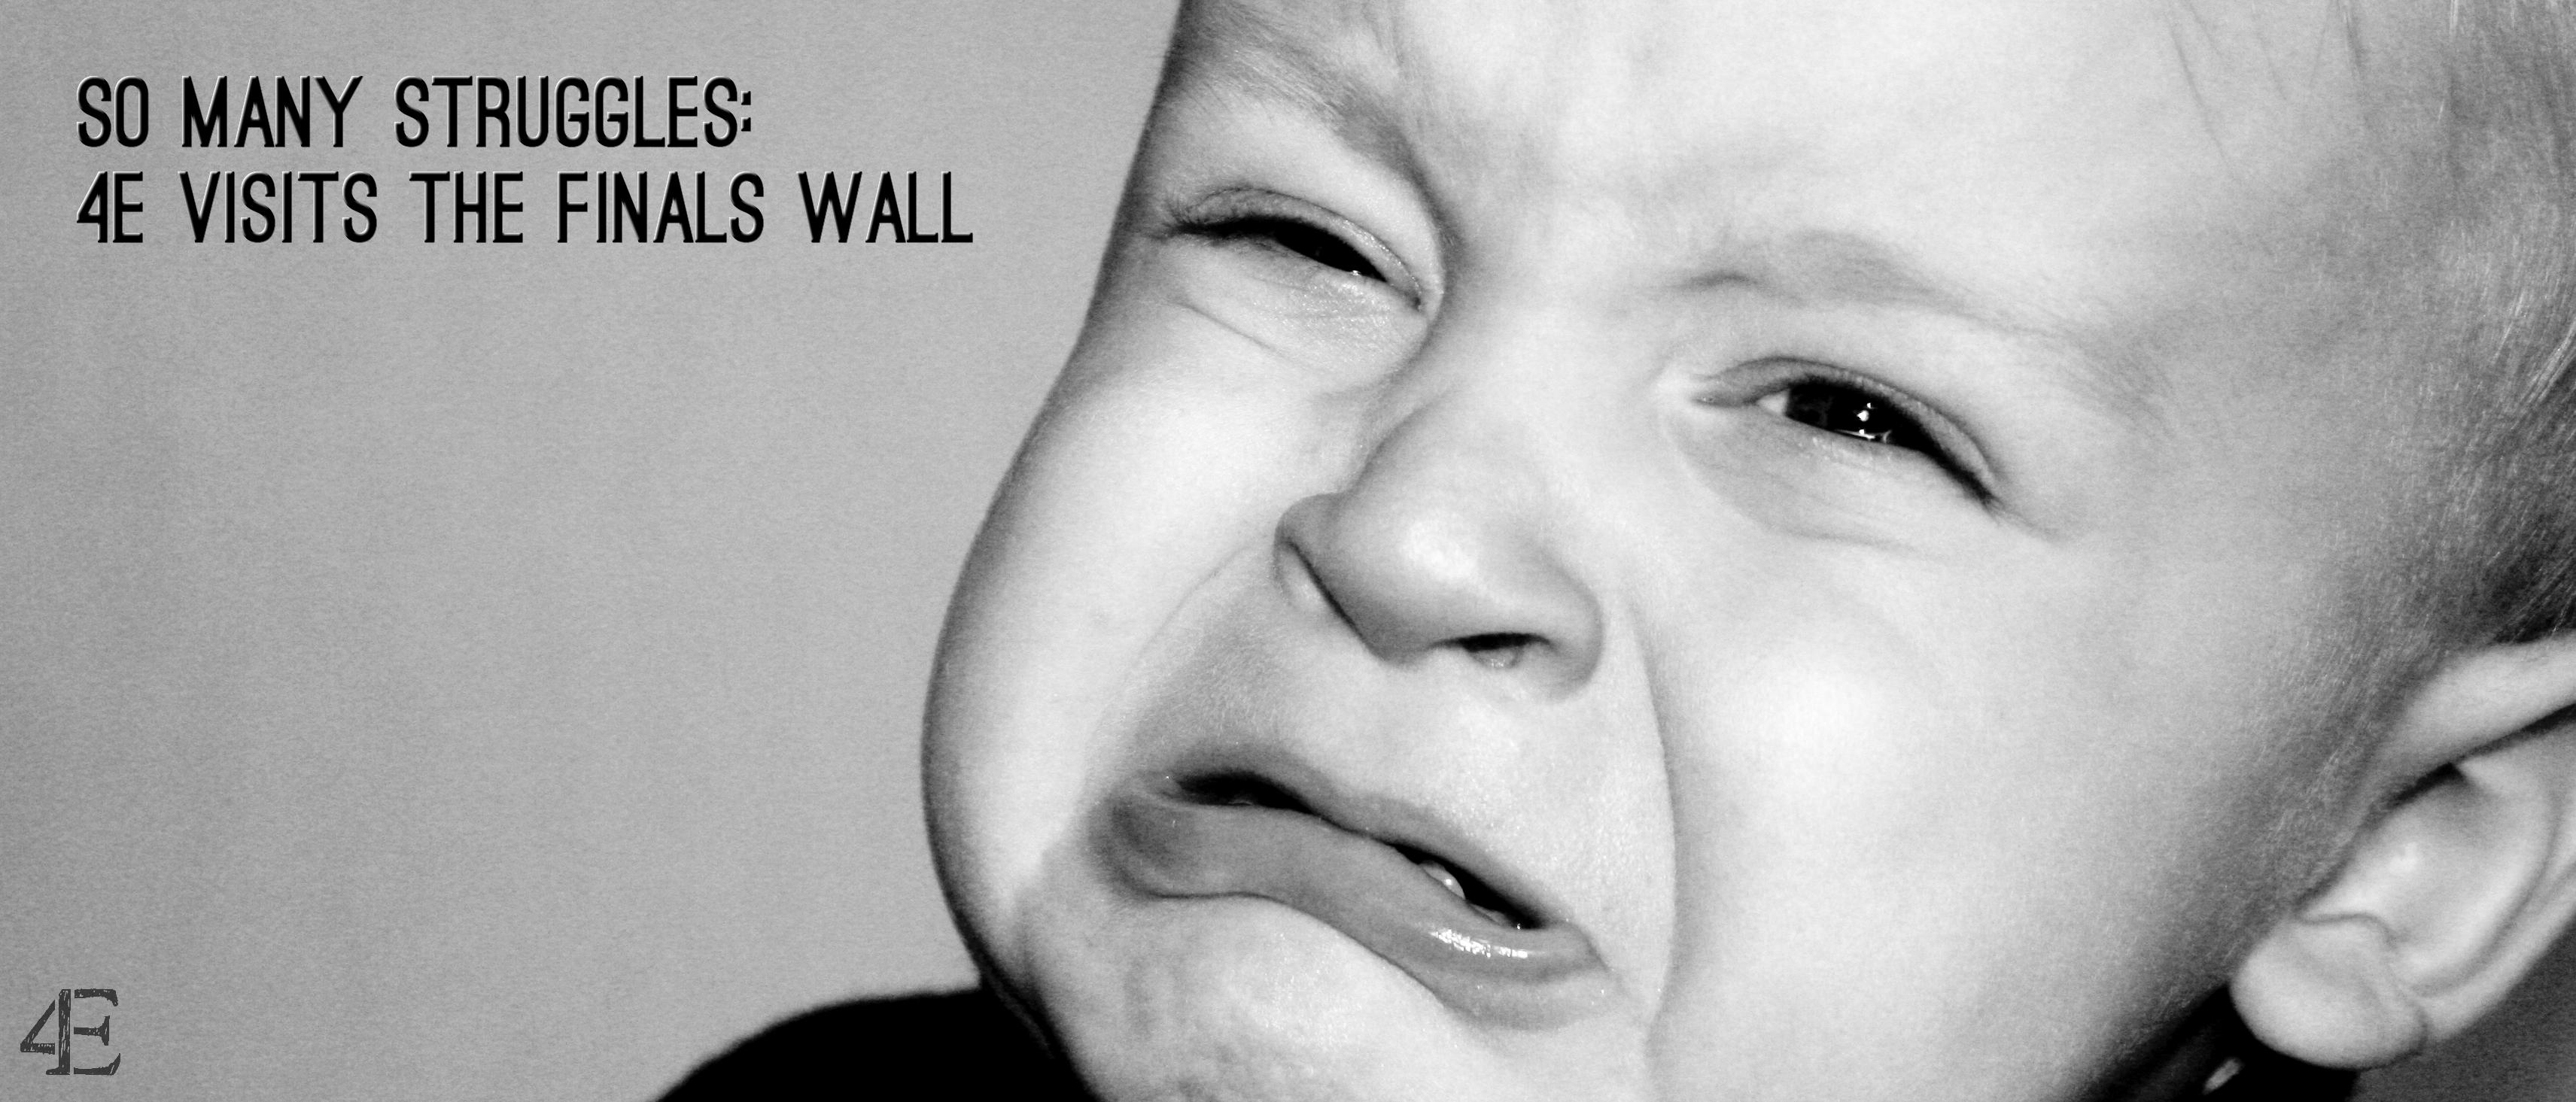 Finals Wall